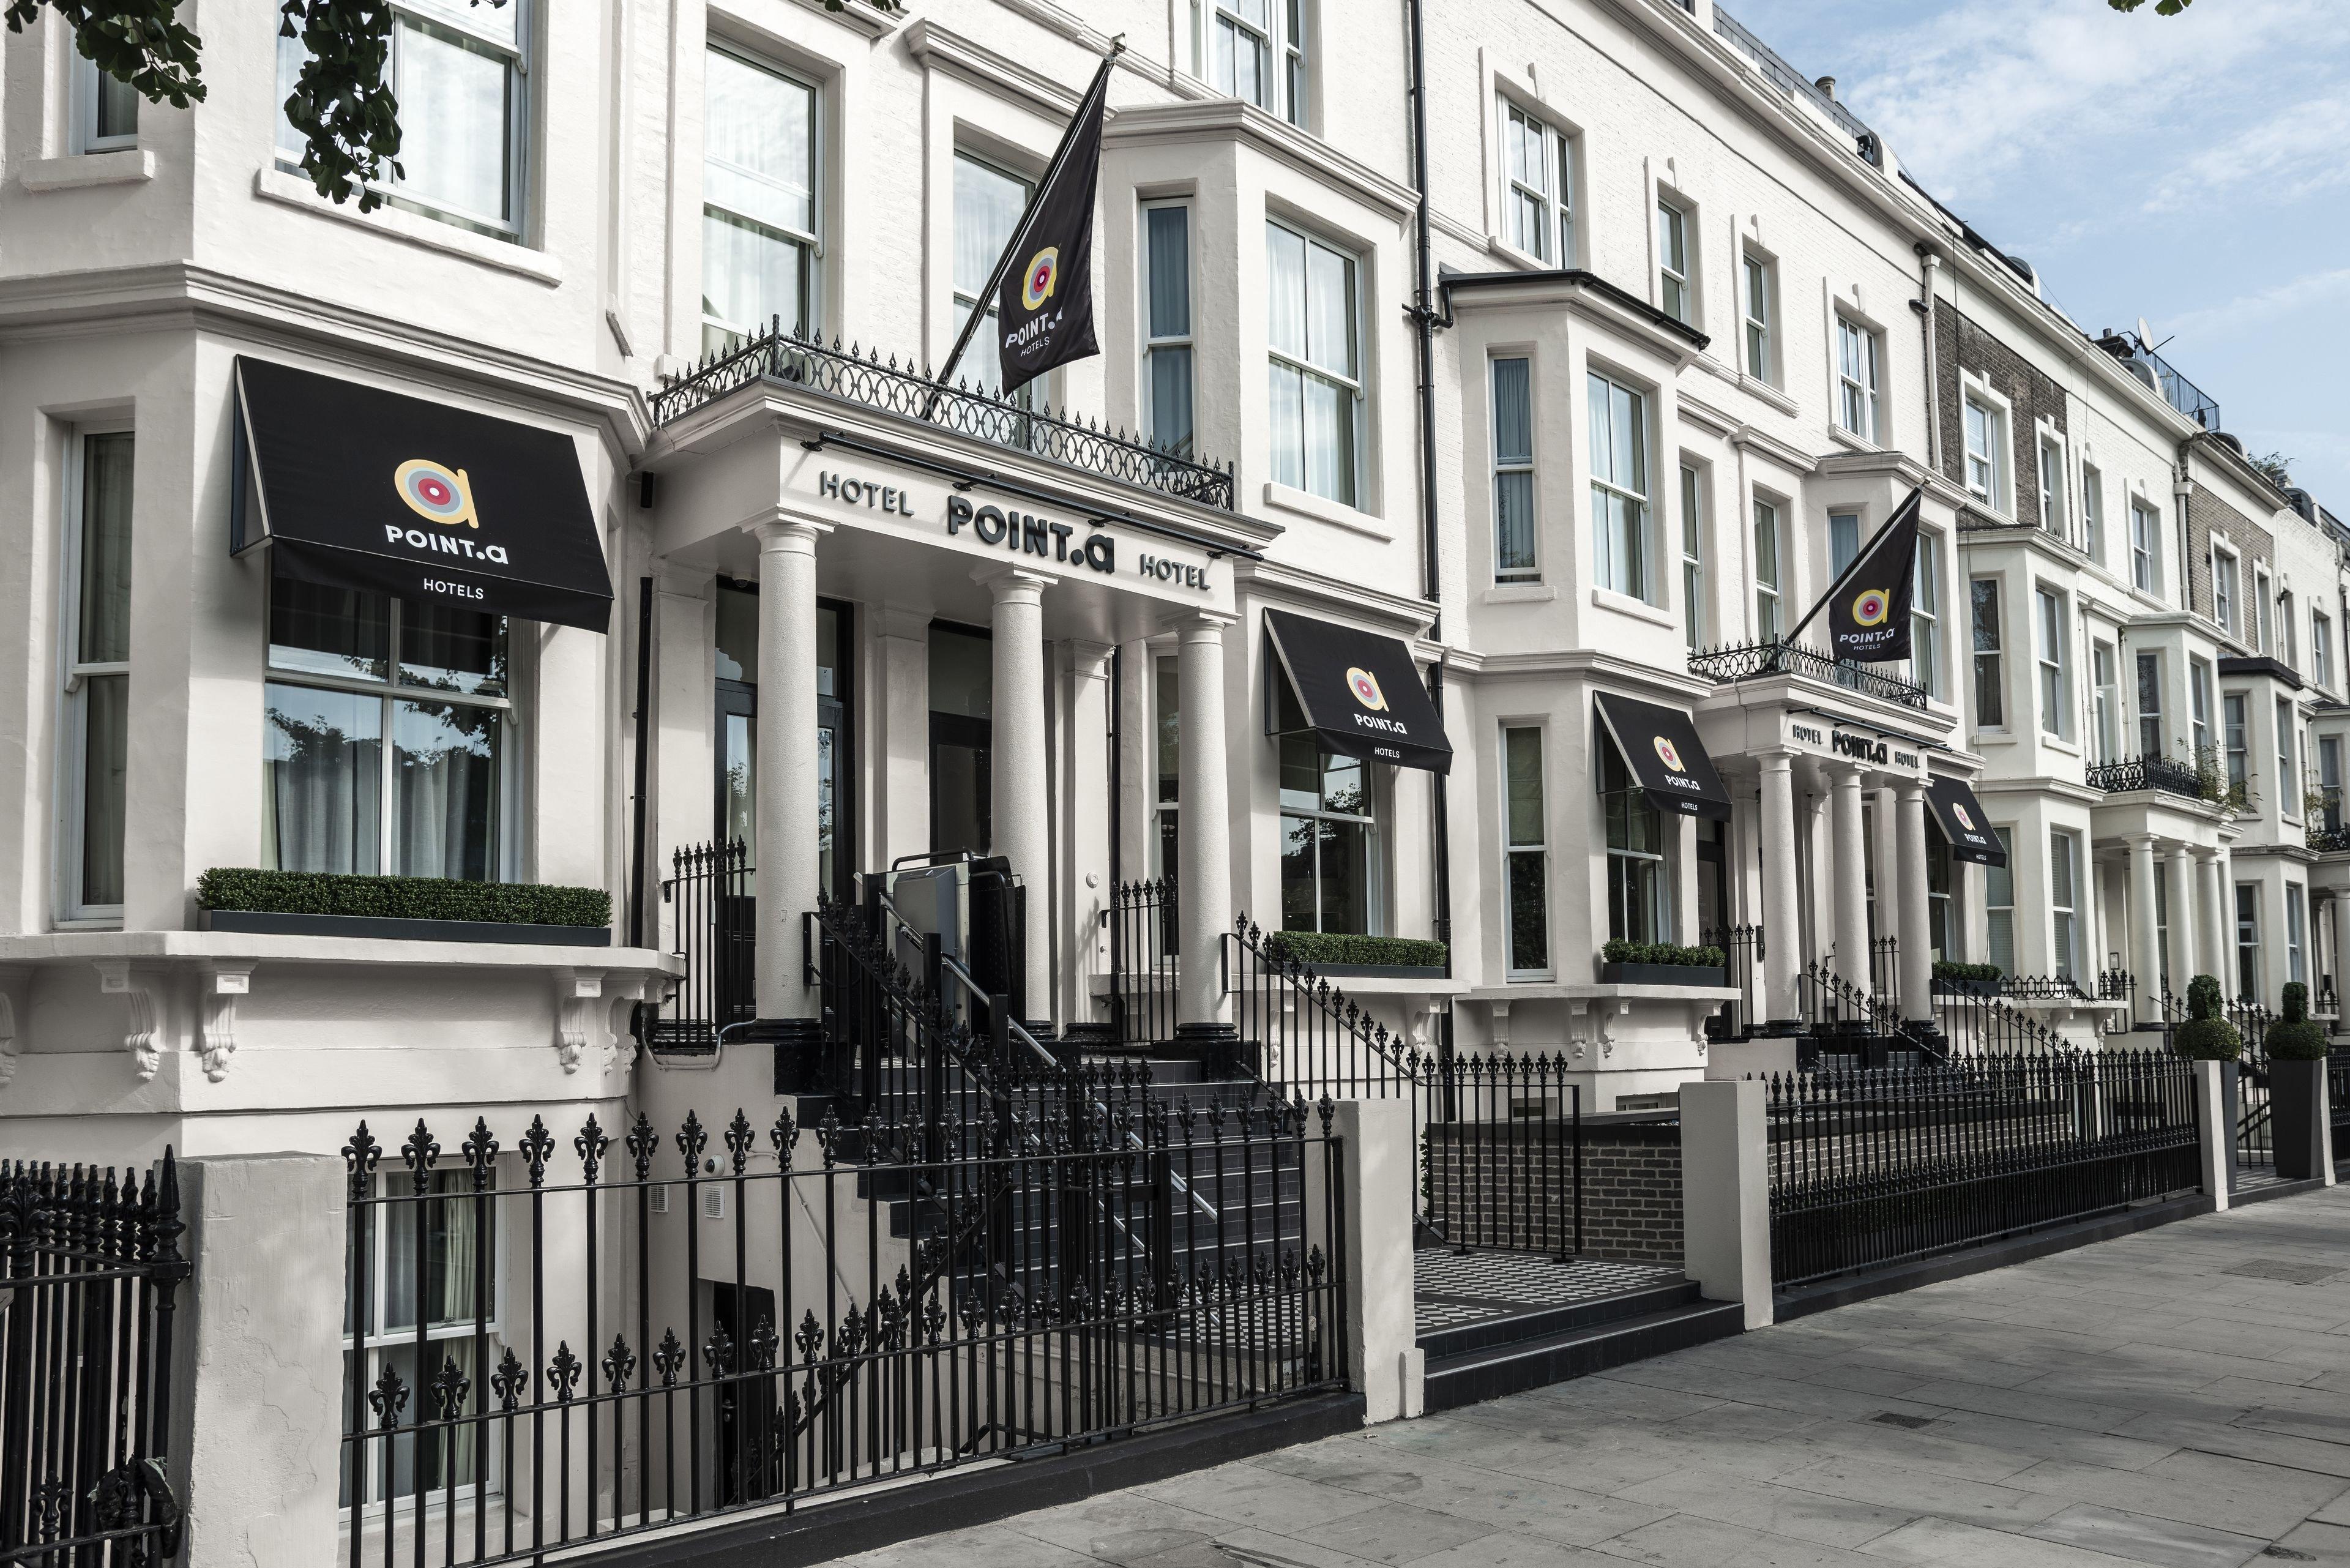 Point A London Kensington Neighborhood Local Information London England Hotels Business Travel Hotels In London Business Travel News